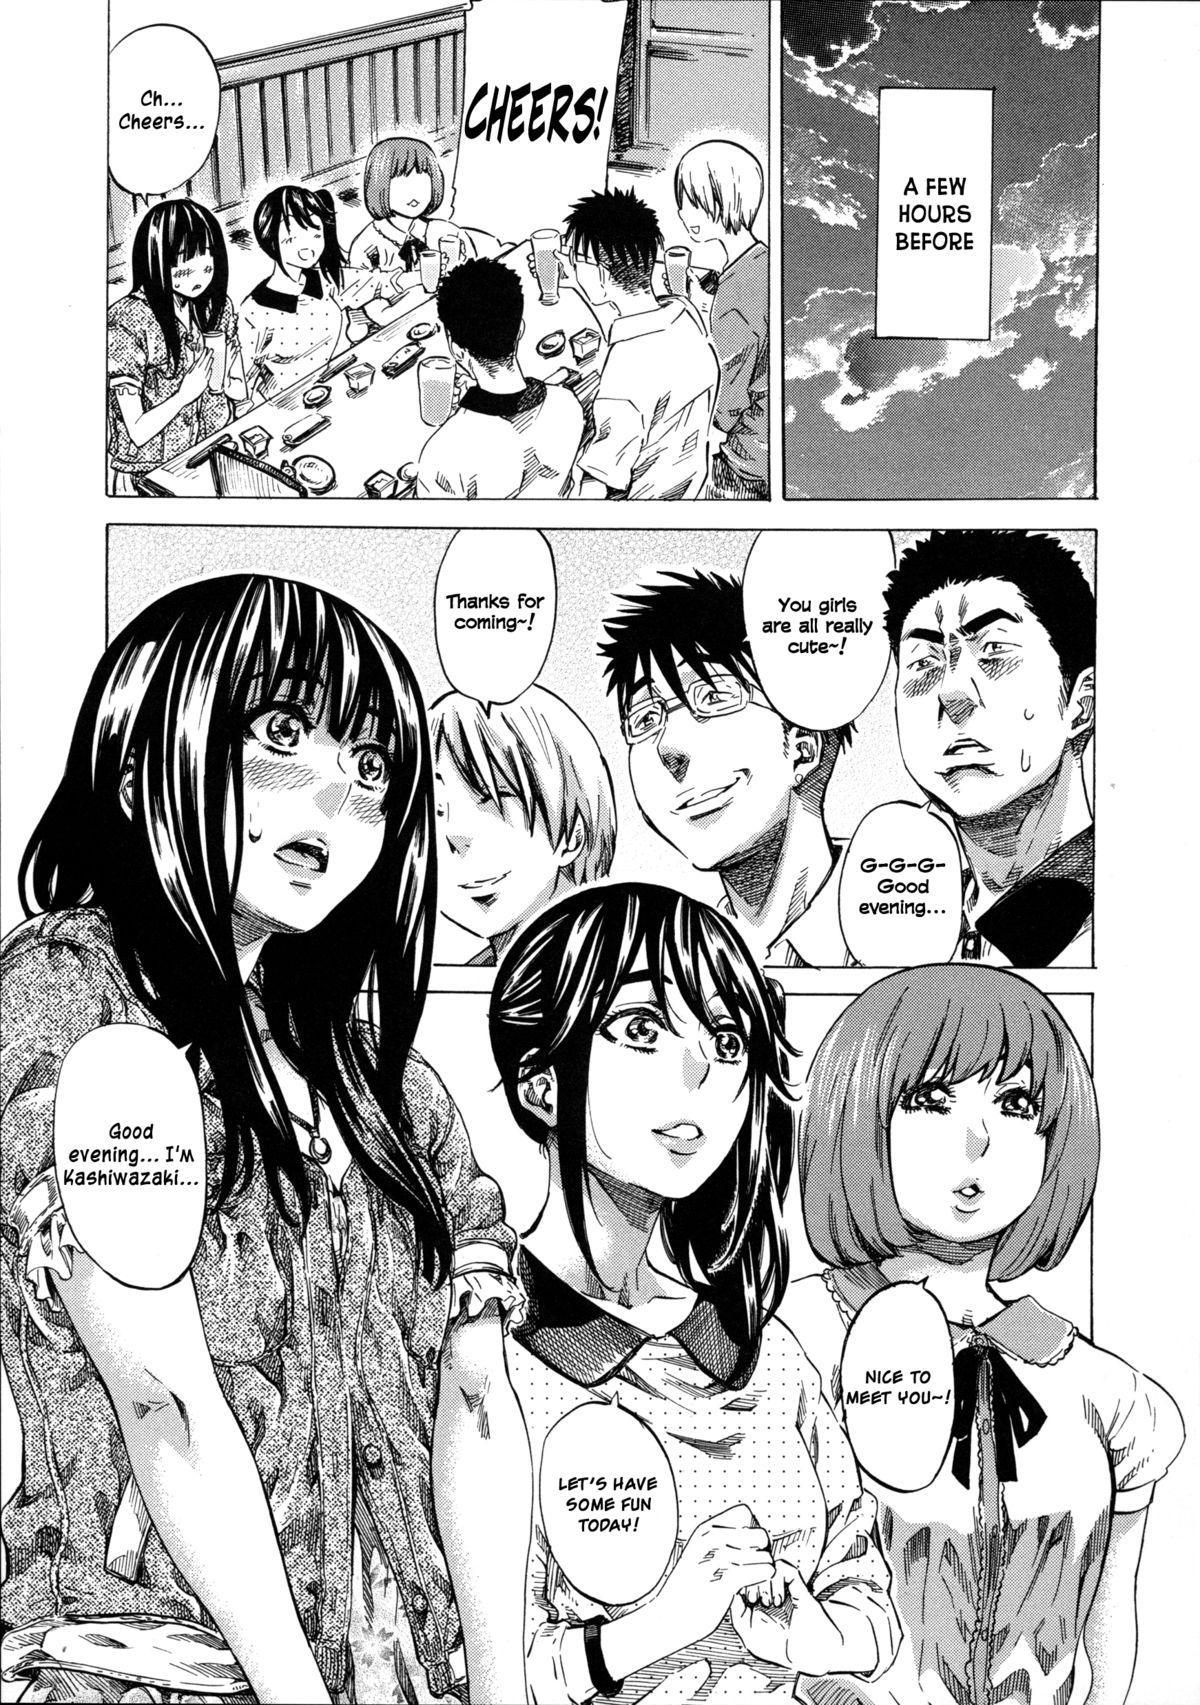 Kashiwazaki Miki wa Ironna Basho de Zenra Sanpo Shitemita | Miki Kashiwazaki Goes Naked in All Sorts of Places 72